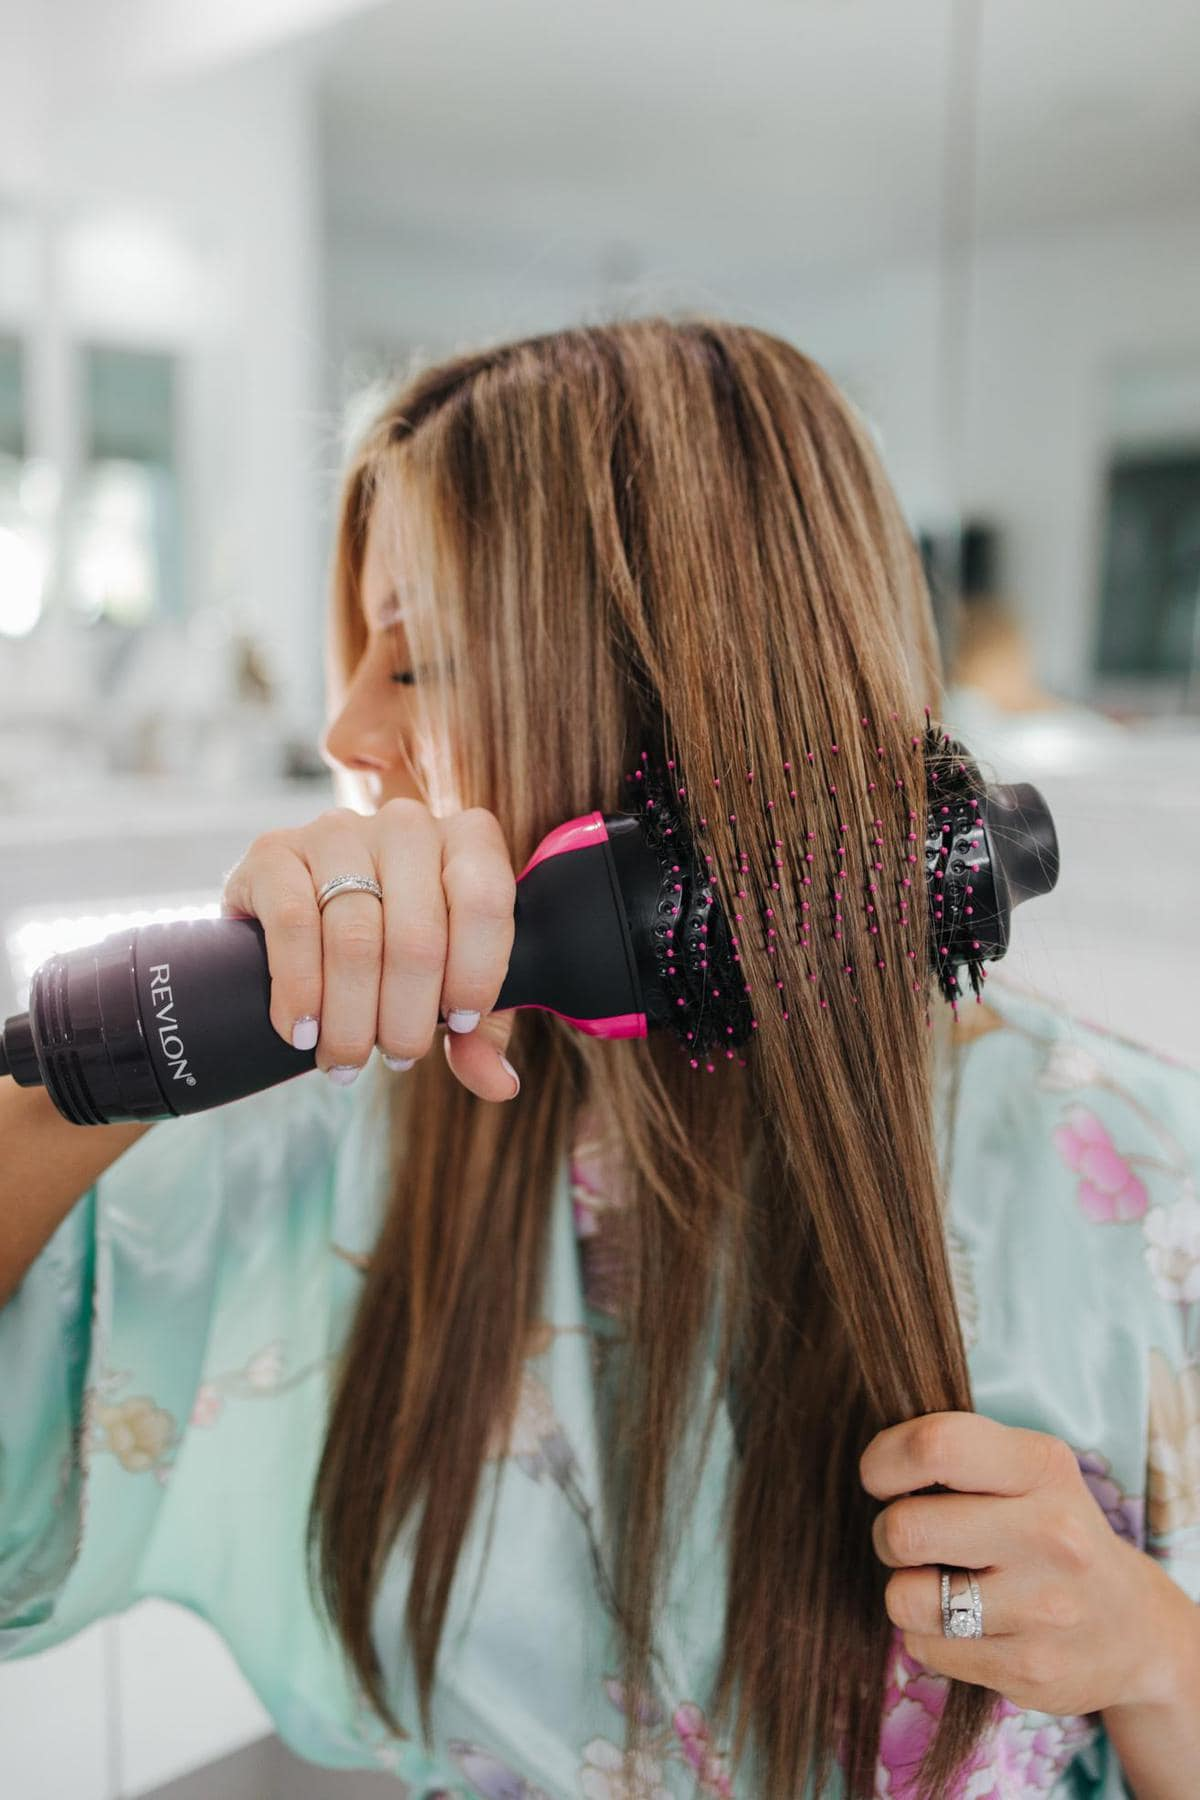 revlon one step hair dryer and volumizer